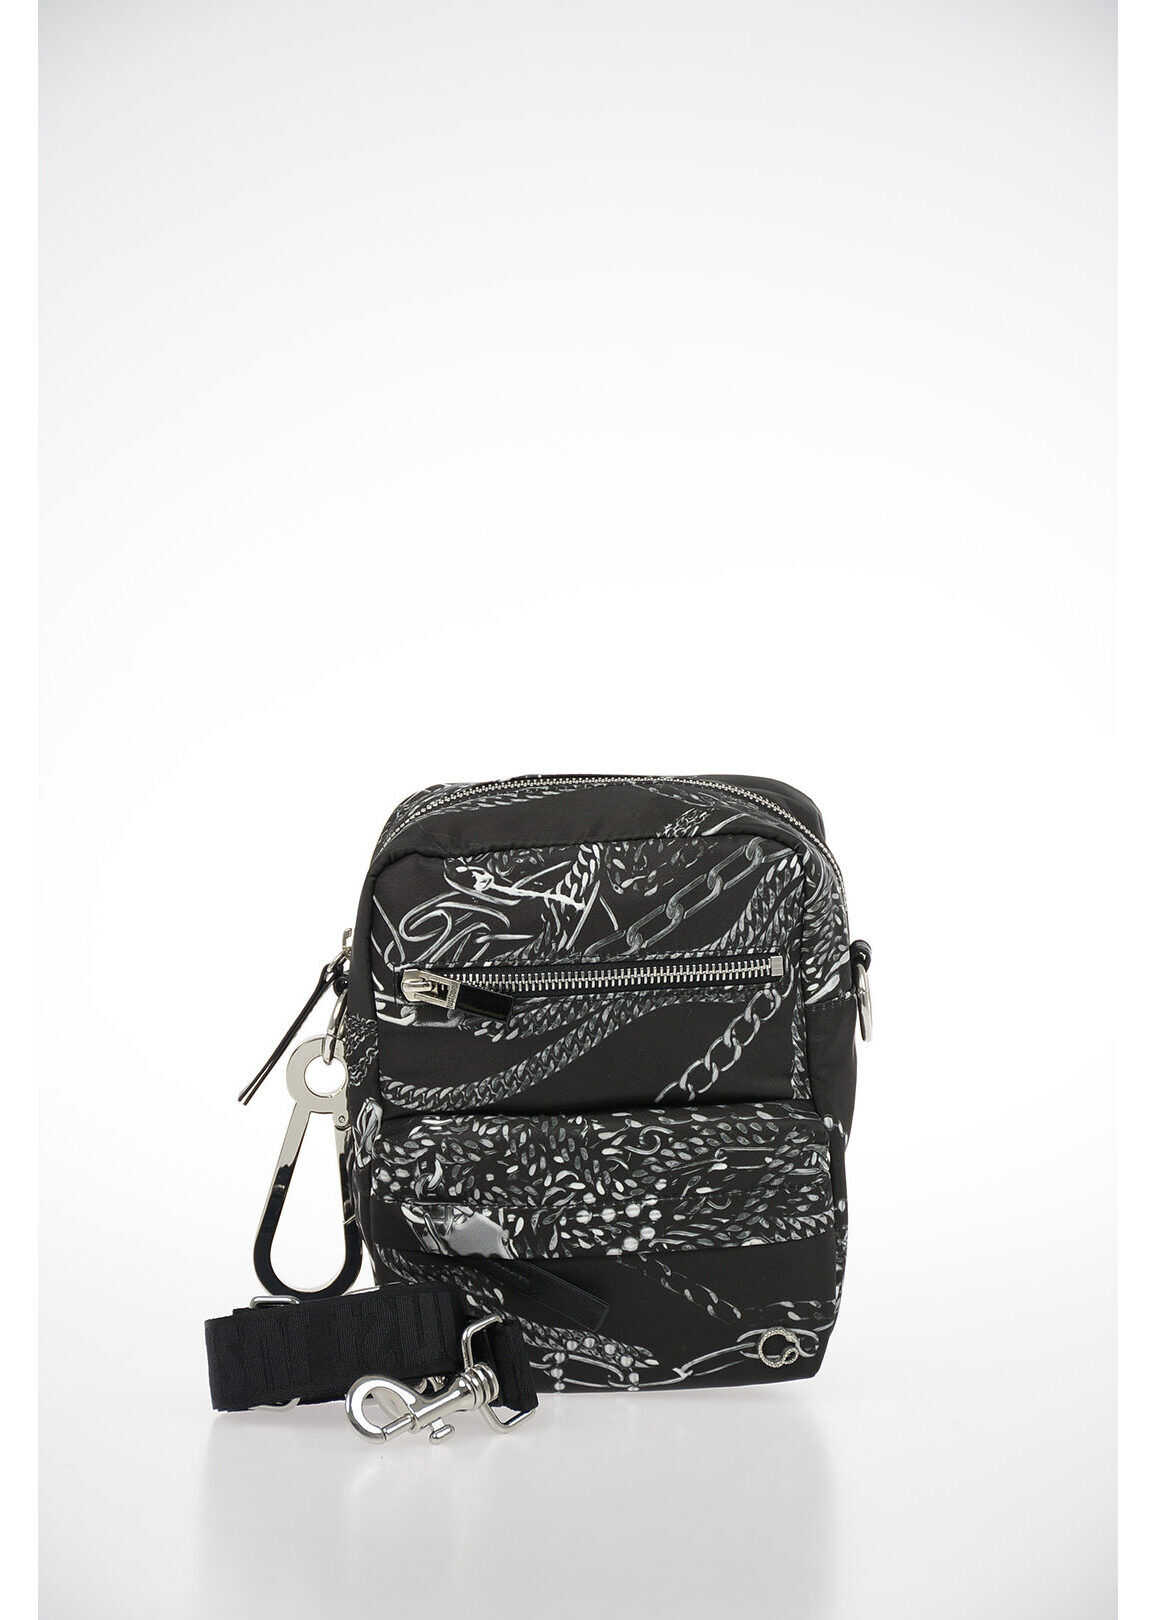 Just Cavalli Printed Shoulder Bag MULTICOLOR imagine b-mall.ro